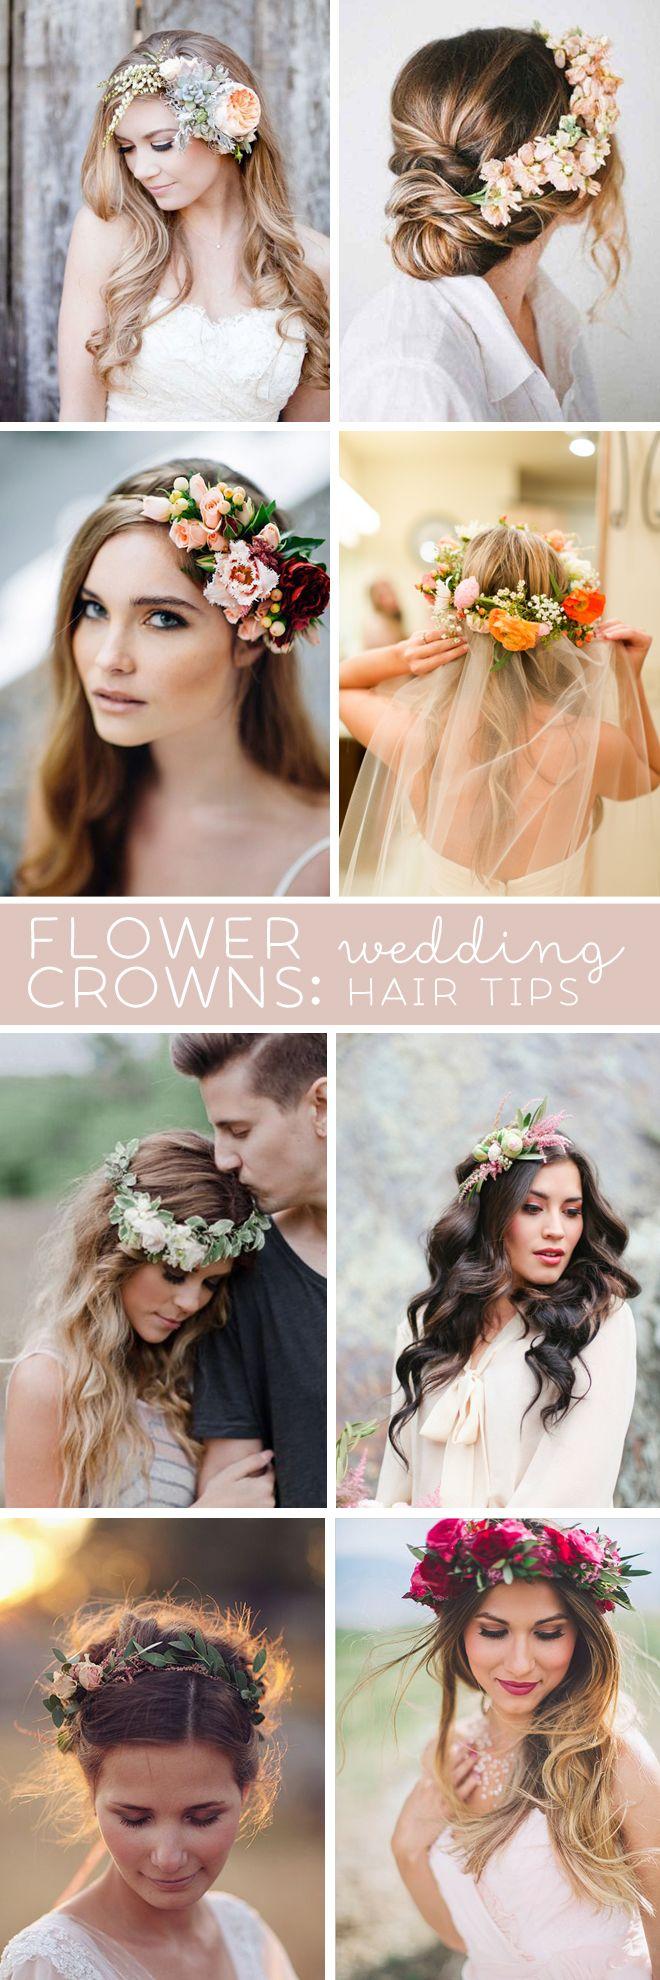 Marvelous 1000 Ideas About Bohemian Wedding Hairstyles On Pinterest Short Hairstyles For Black Women Fulllsitofus